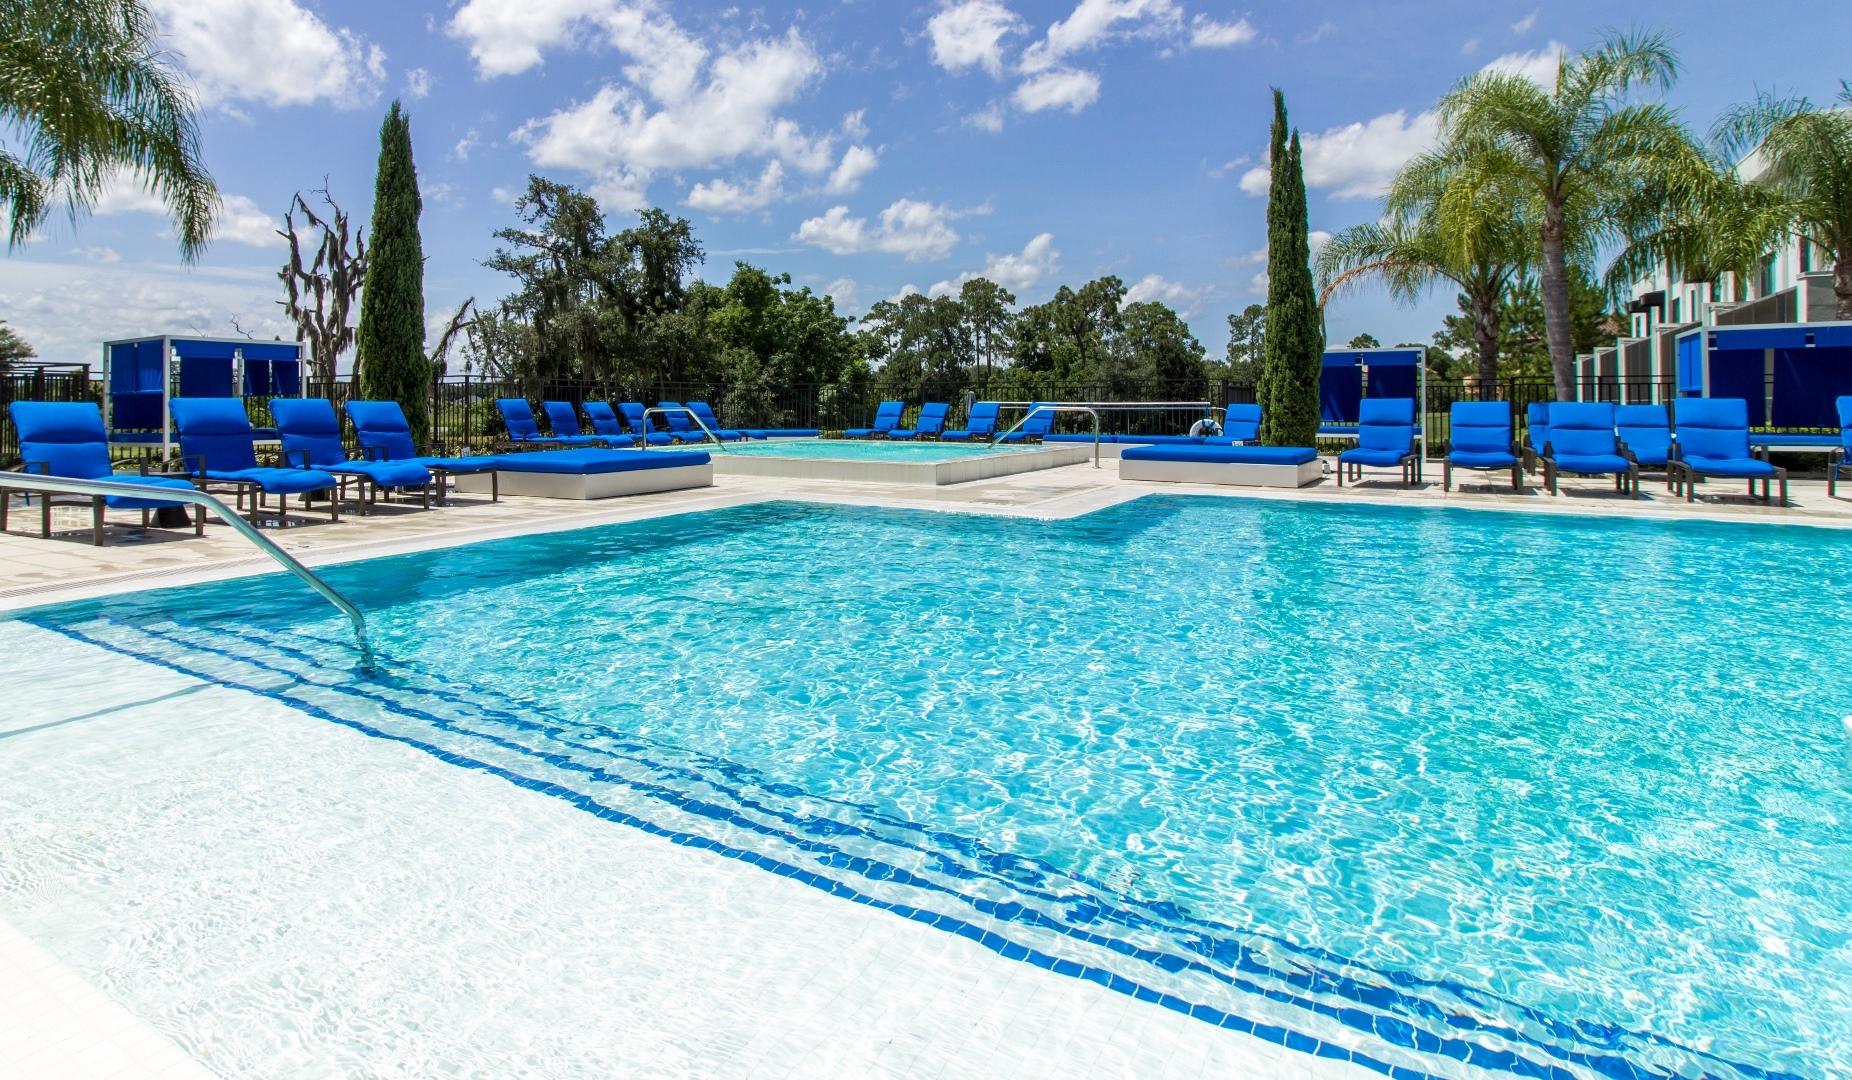 Shimmering Swimming Pool At Pure Living Heathrow, Heathrow, Florida